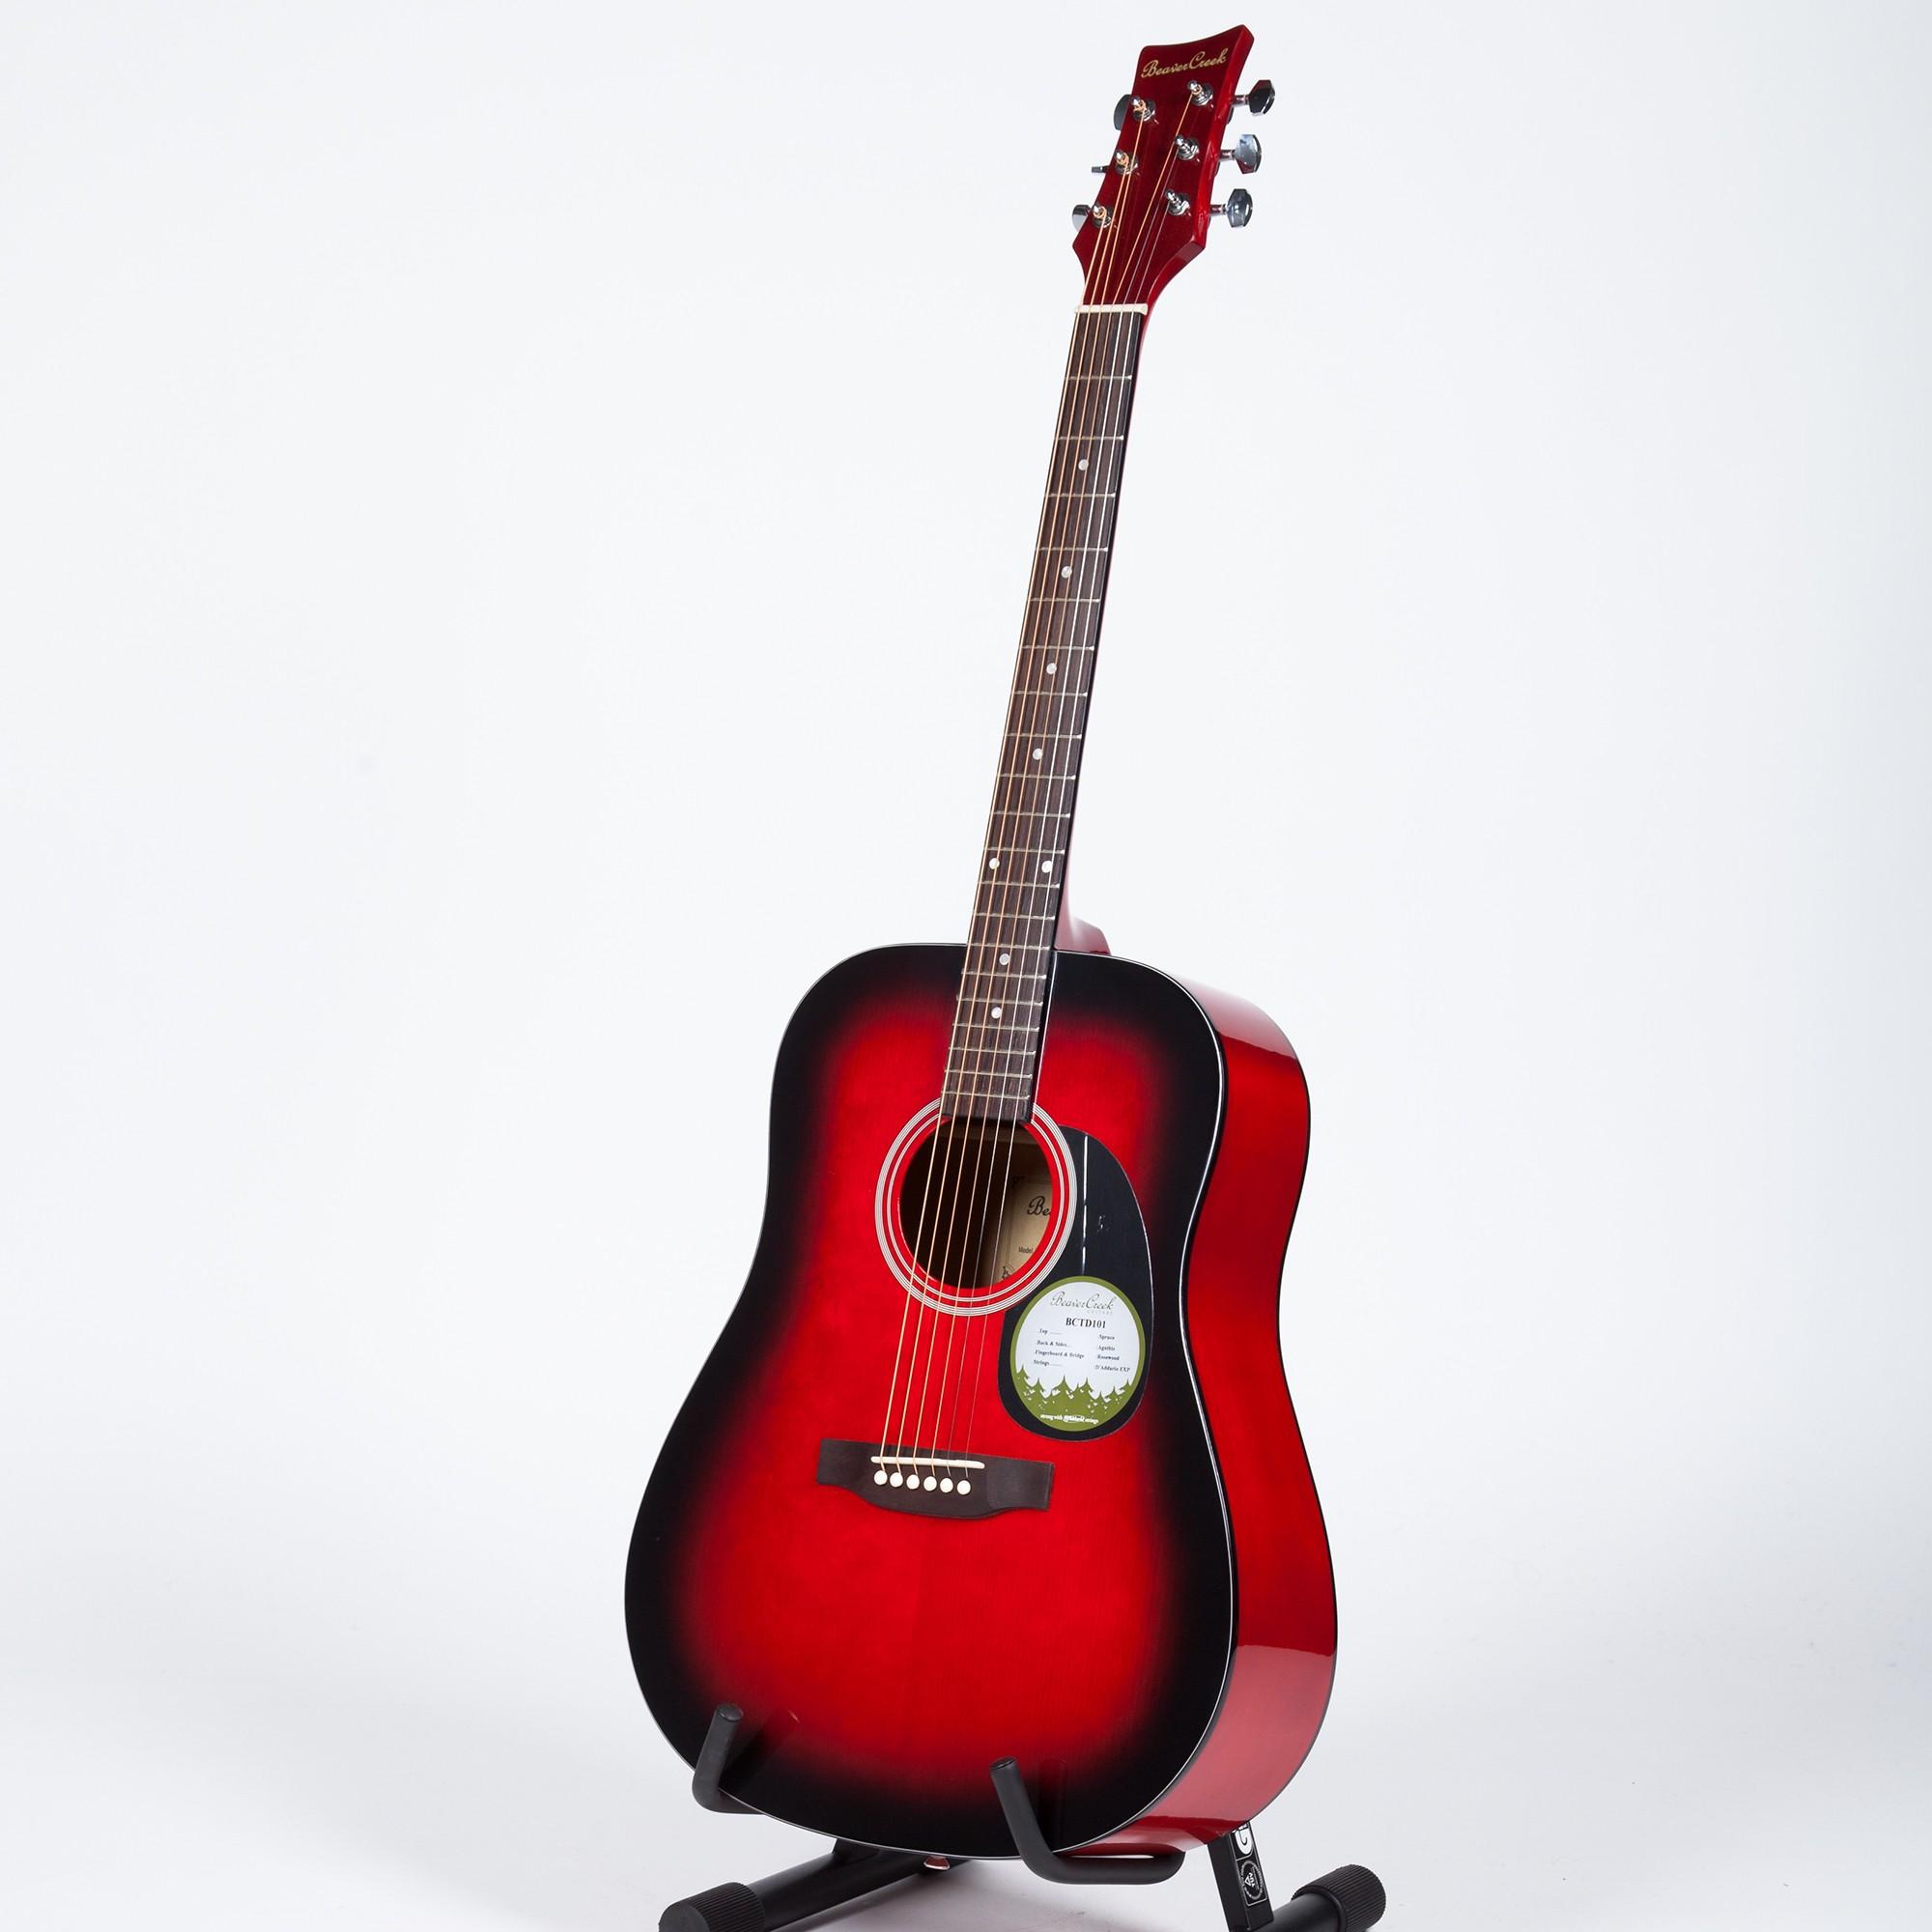 BeaverCreek BCTD101 Dreadnought Acoustic Guitar - Redburst ...